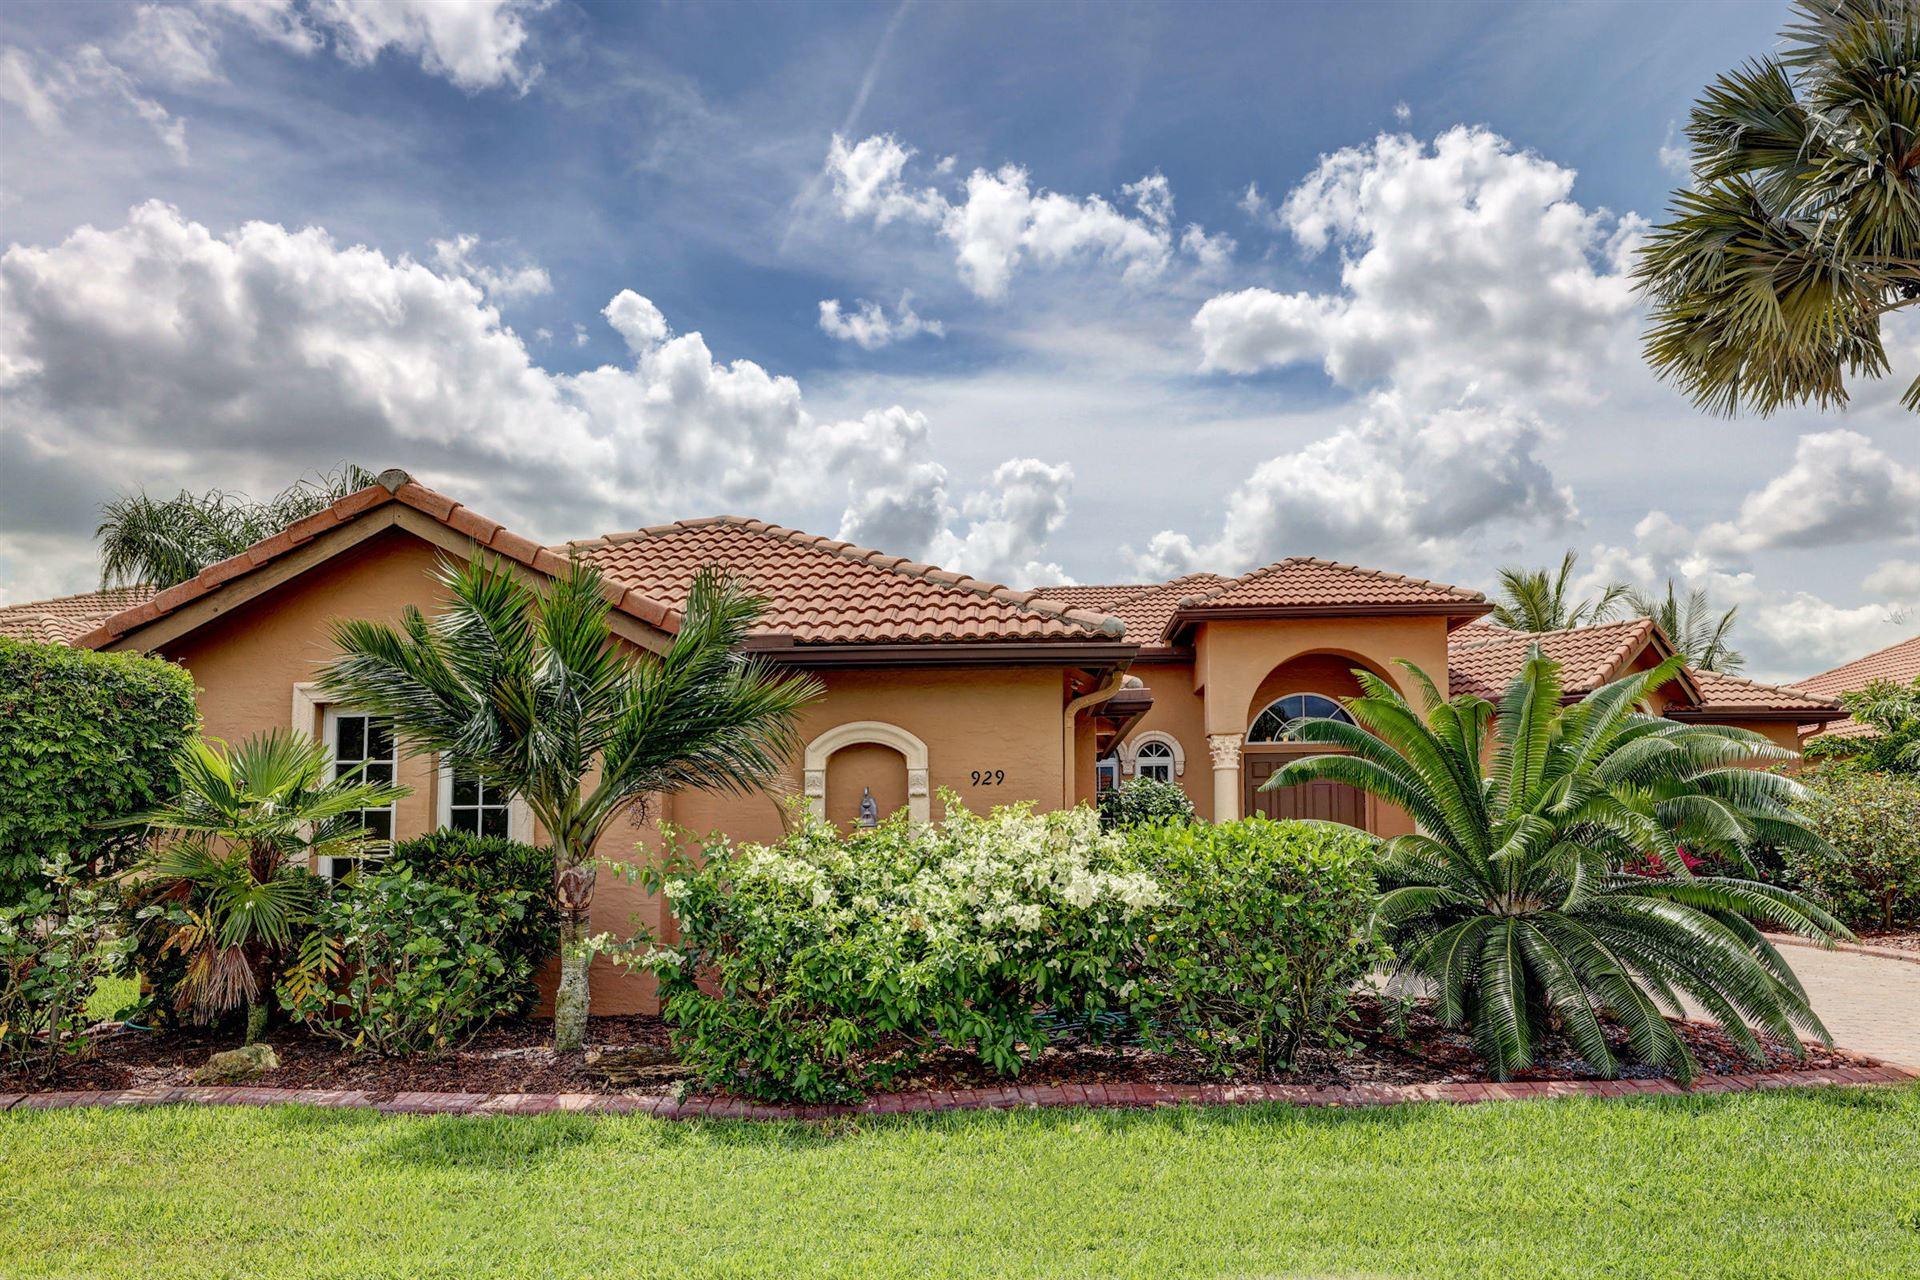 929 SW Grand Reserves Boulevard, Port Saint Lucie, FL 34986 - #: RX-10704821